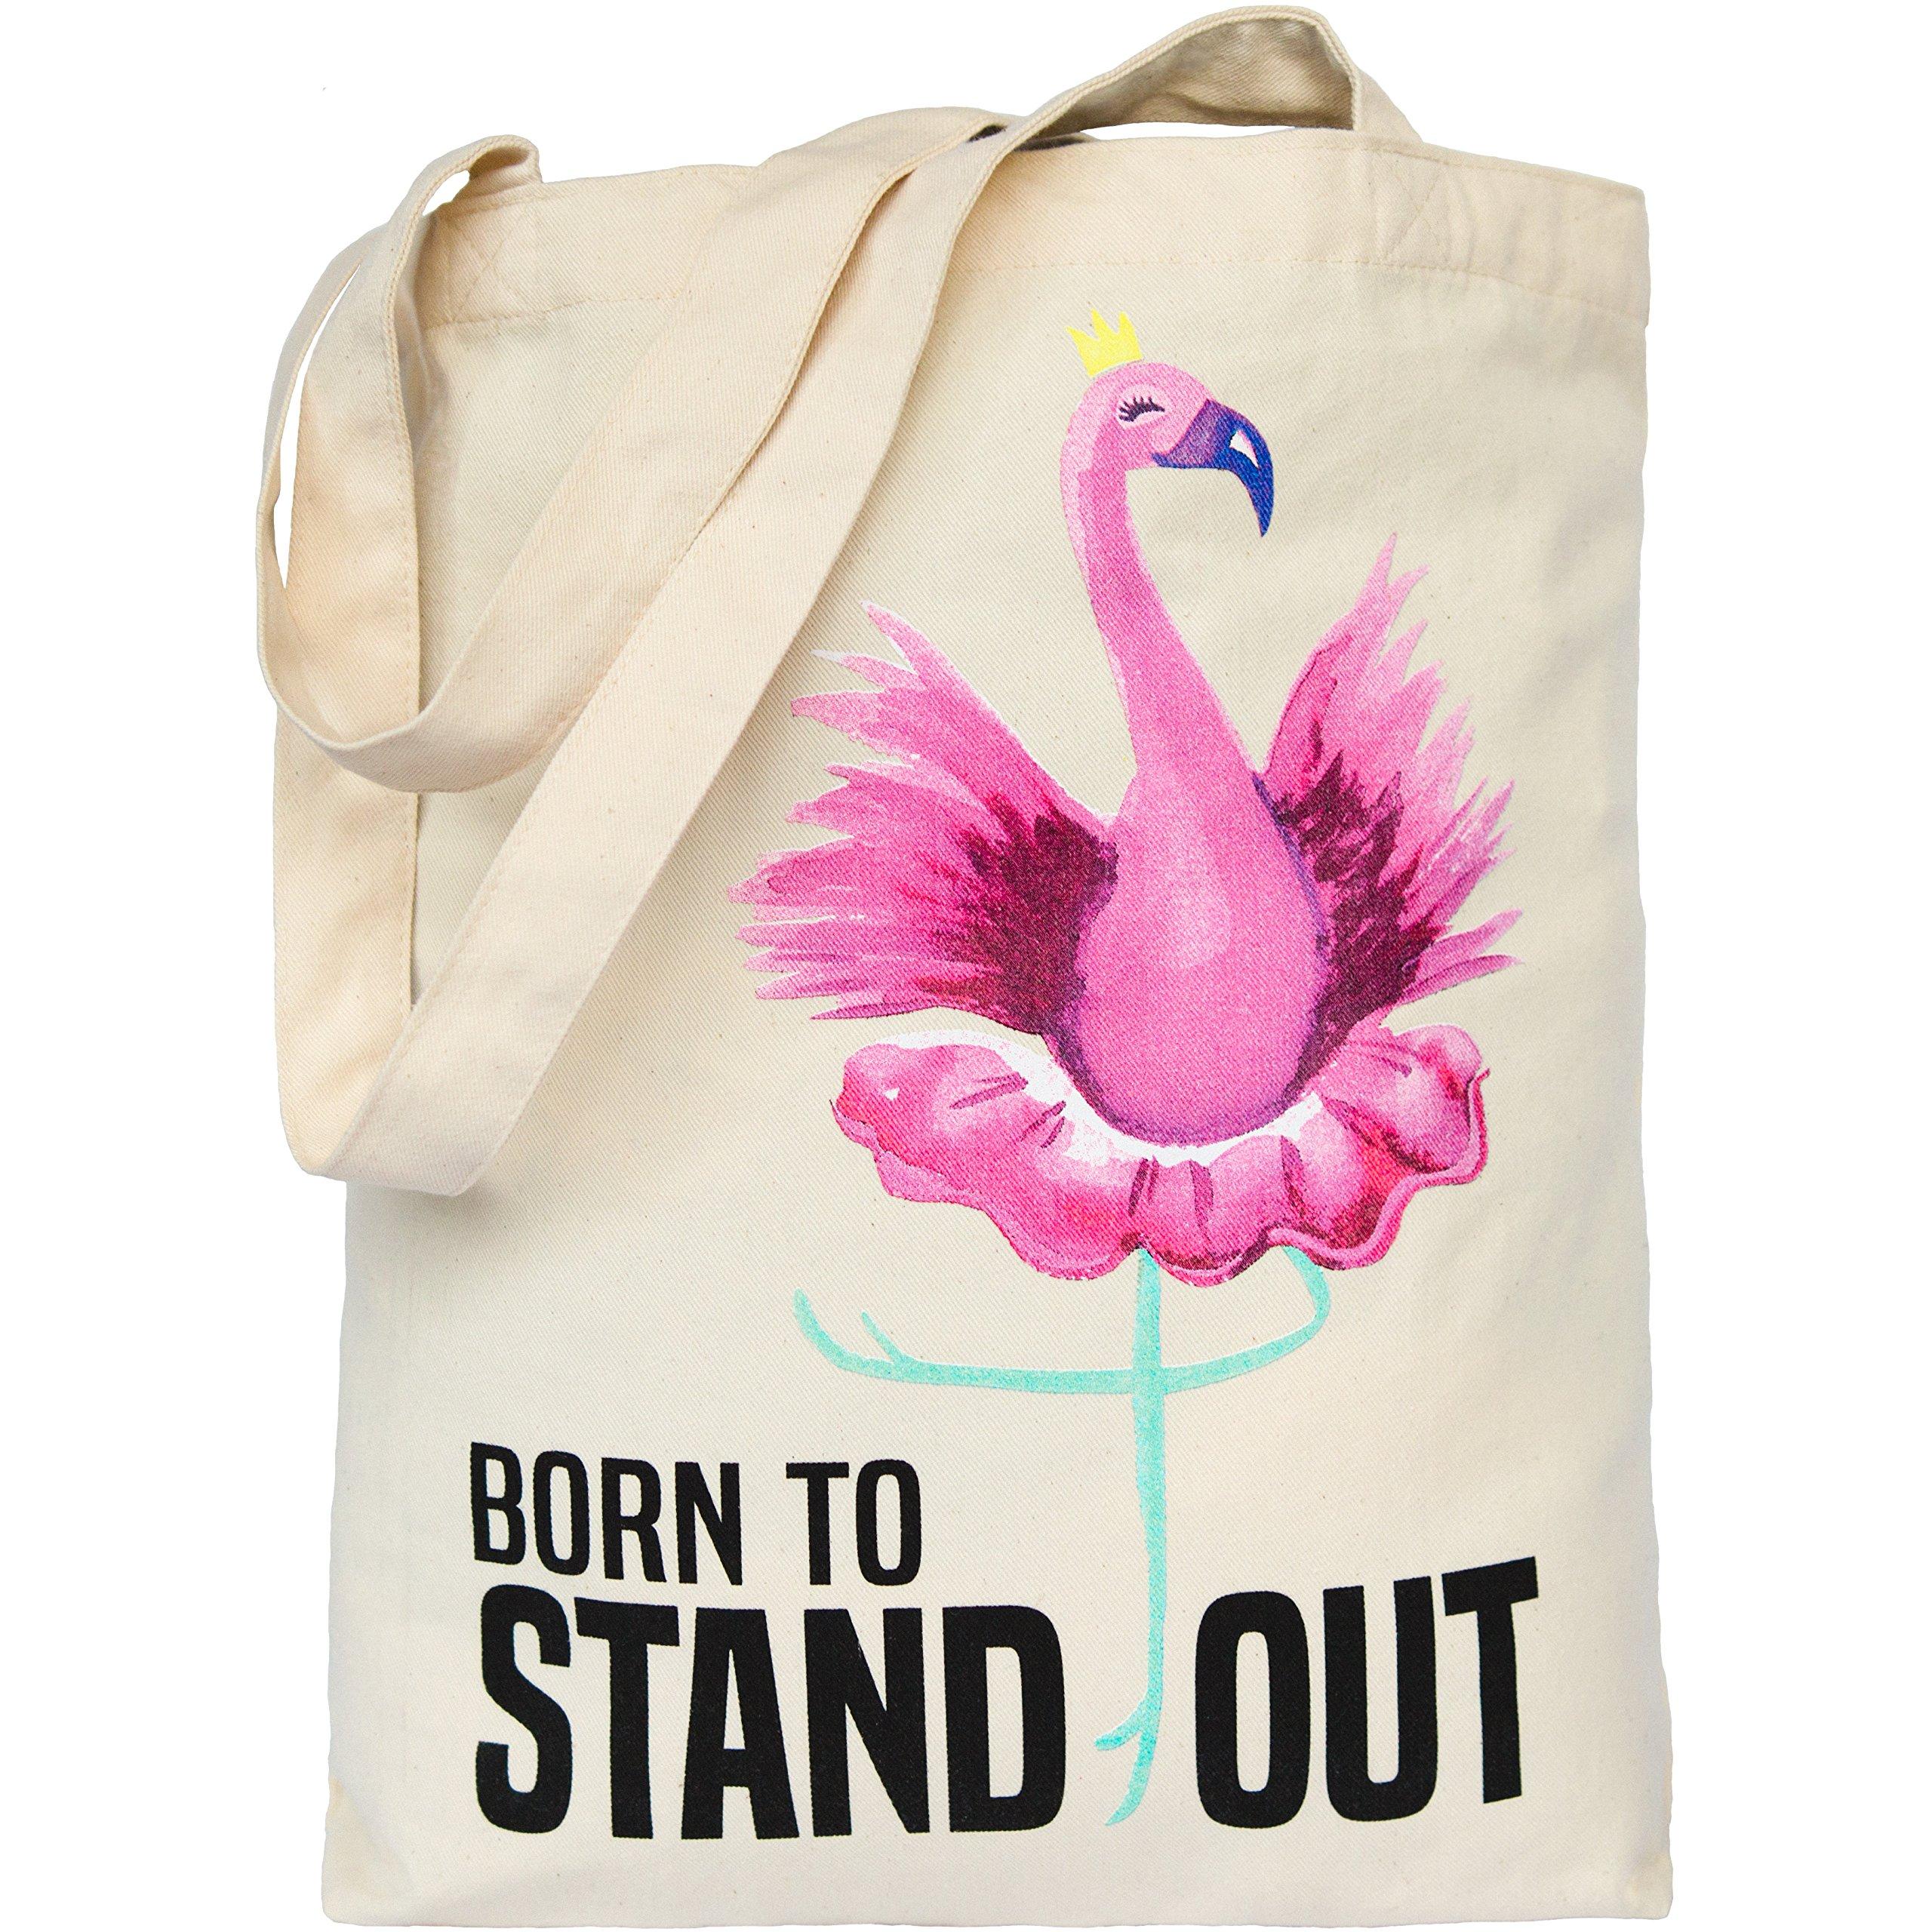 Pink Flamingo Tote Bag Printed Eco Canvas Cotton Handbag for Beach Women Girls Gift